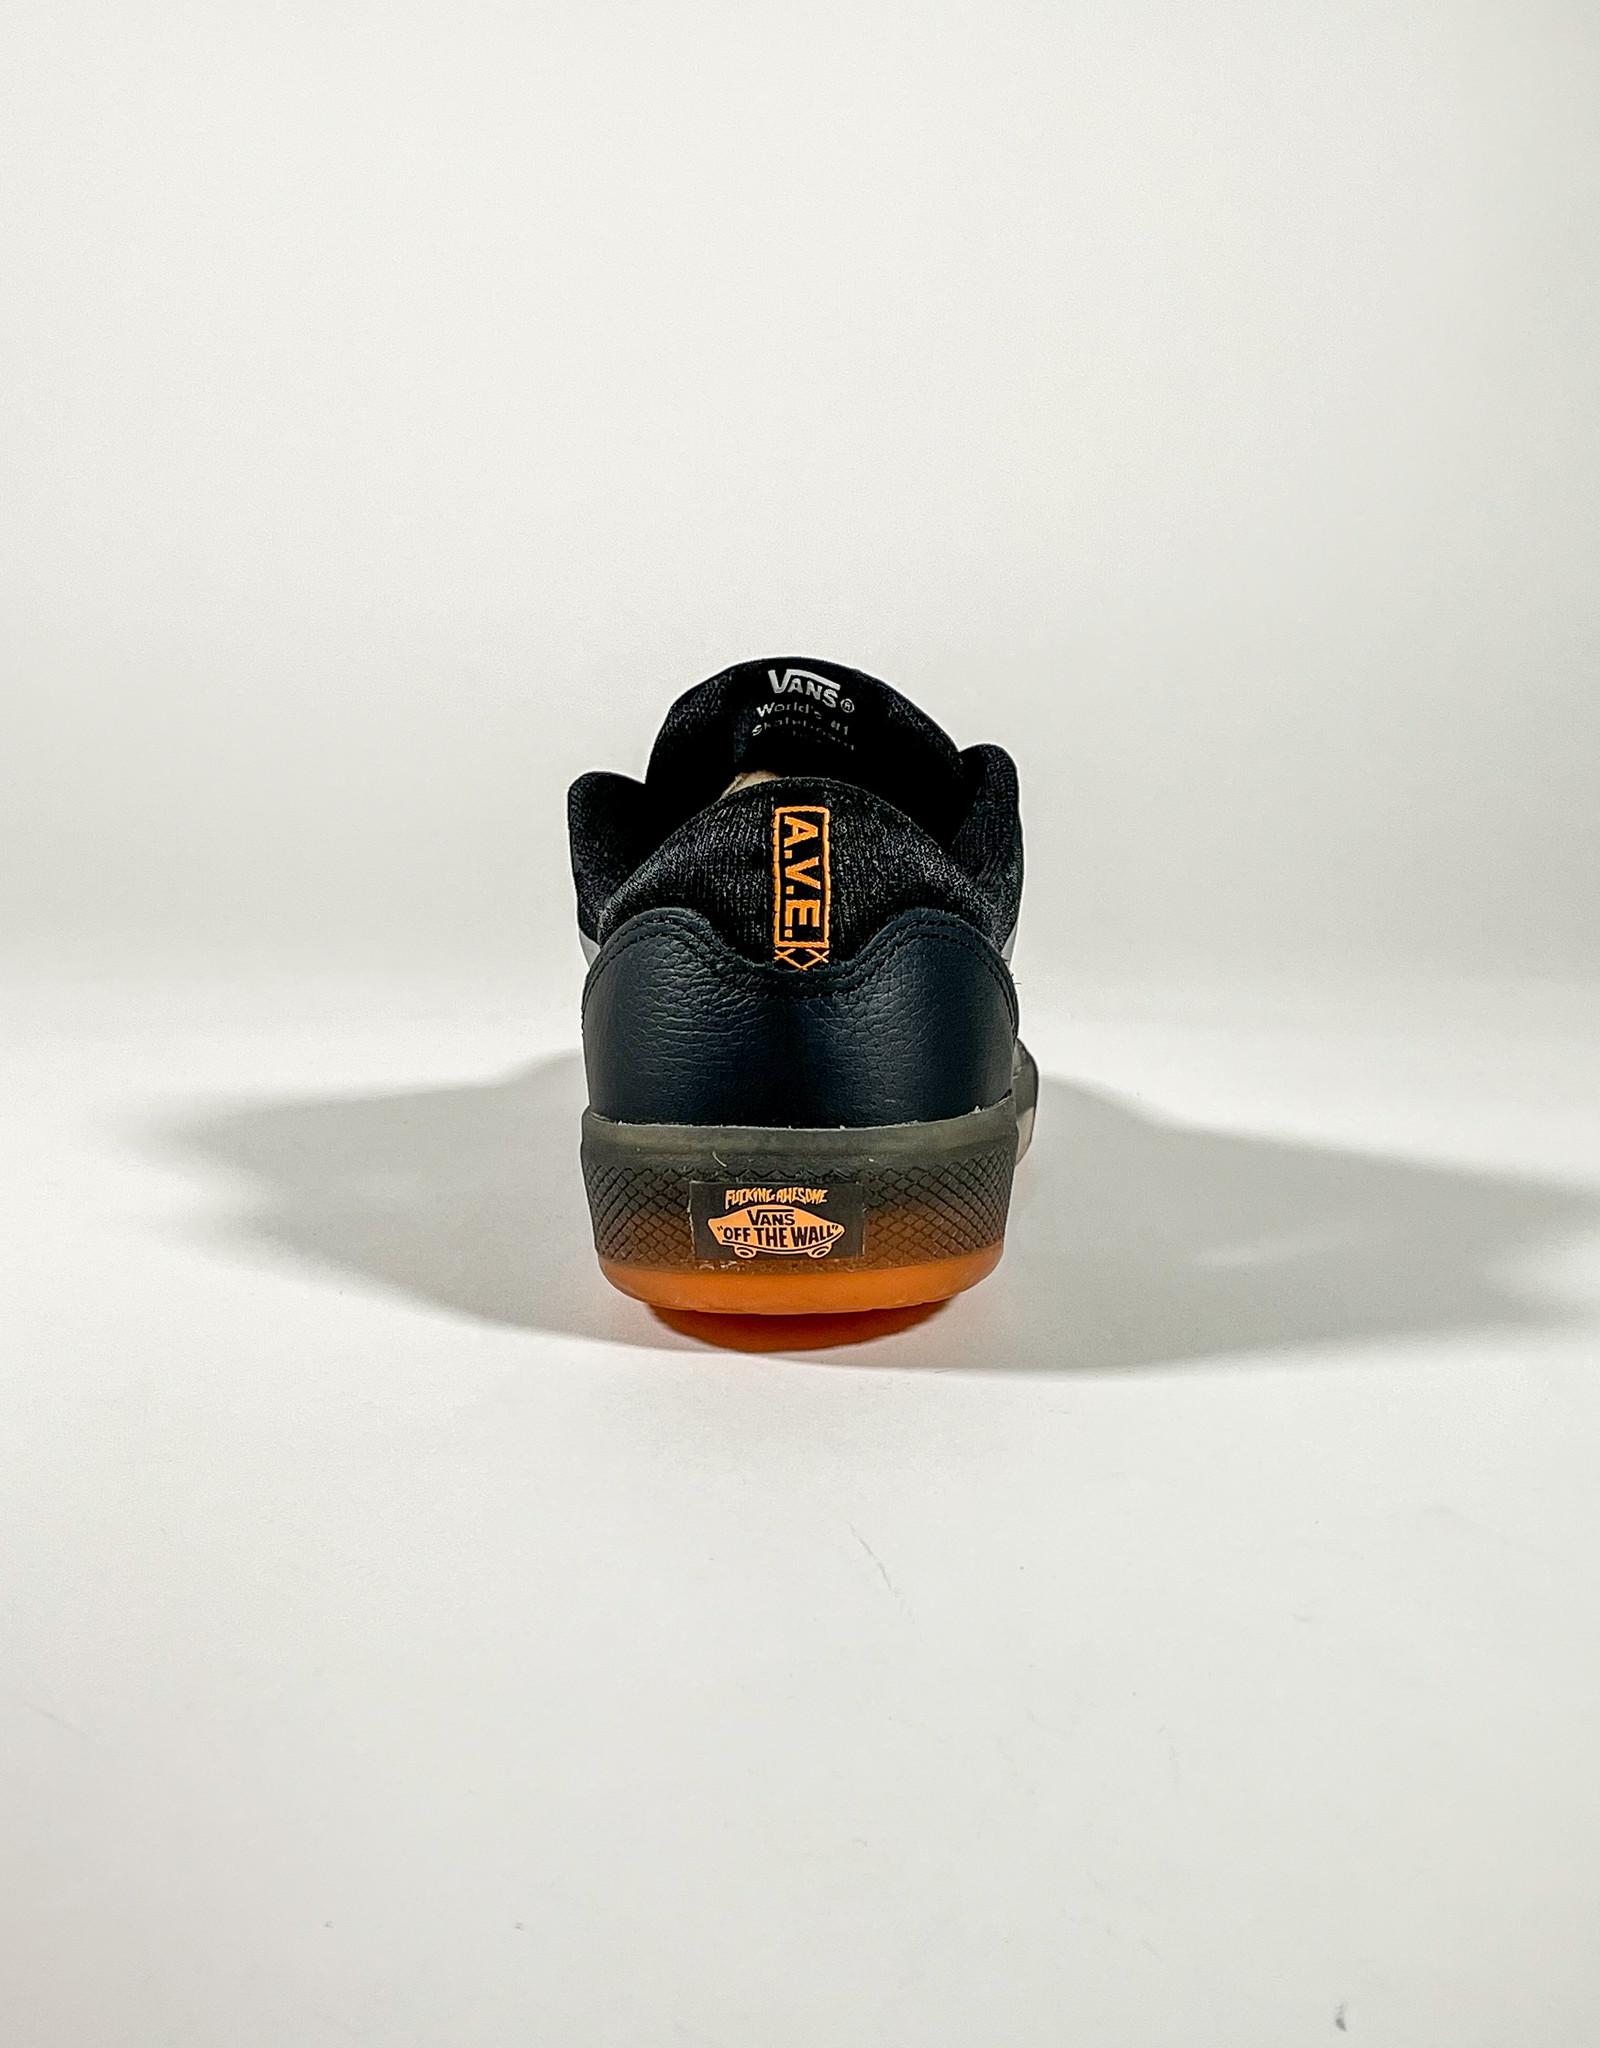 VANS VANS AVE PRO LTD F/A BLACK REFLECTIVE - 8.0